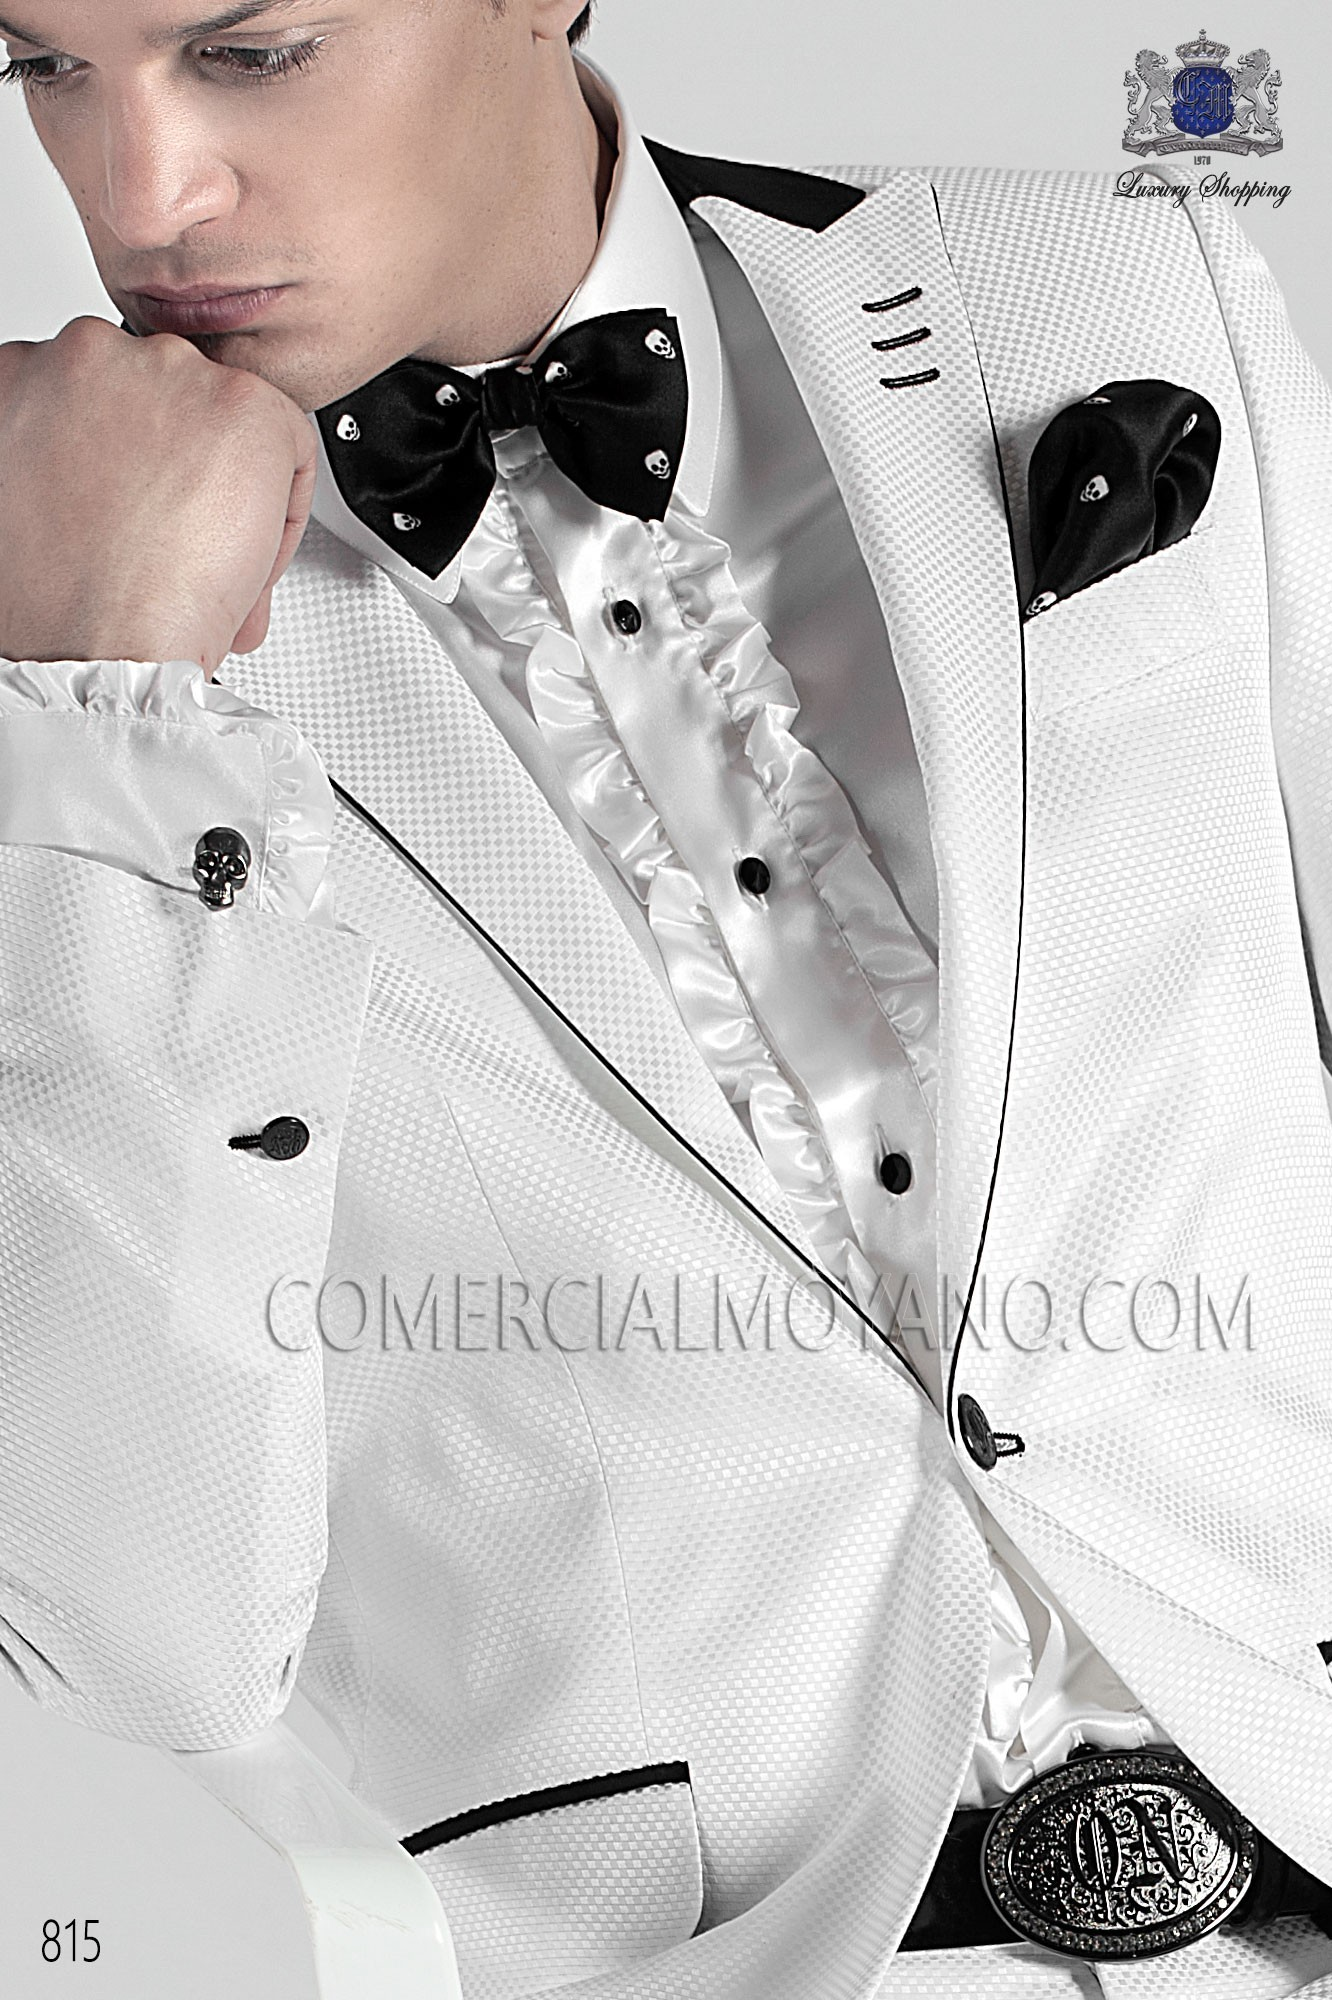 Italian emotion white men wedding suit, model: 815 Ottavio Nuccio Gala Emotion Collection